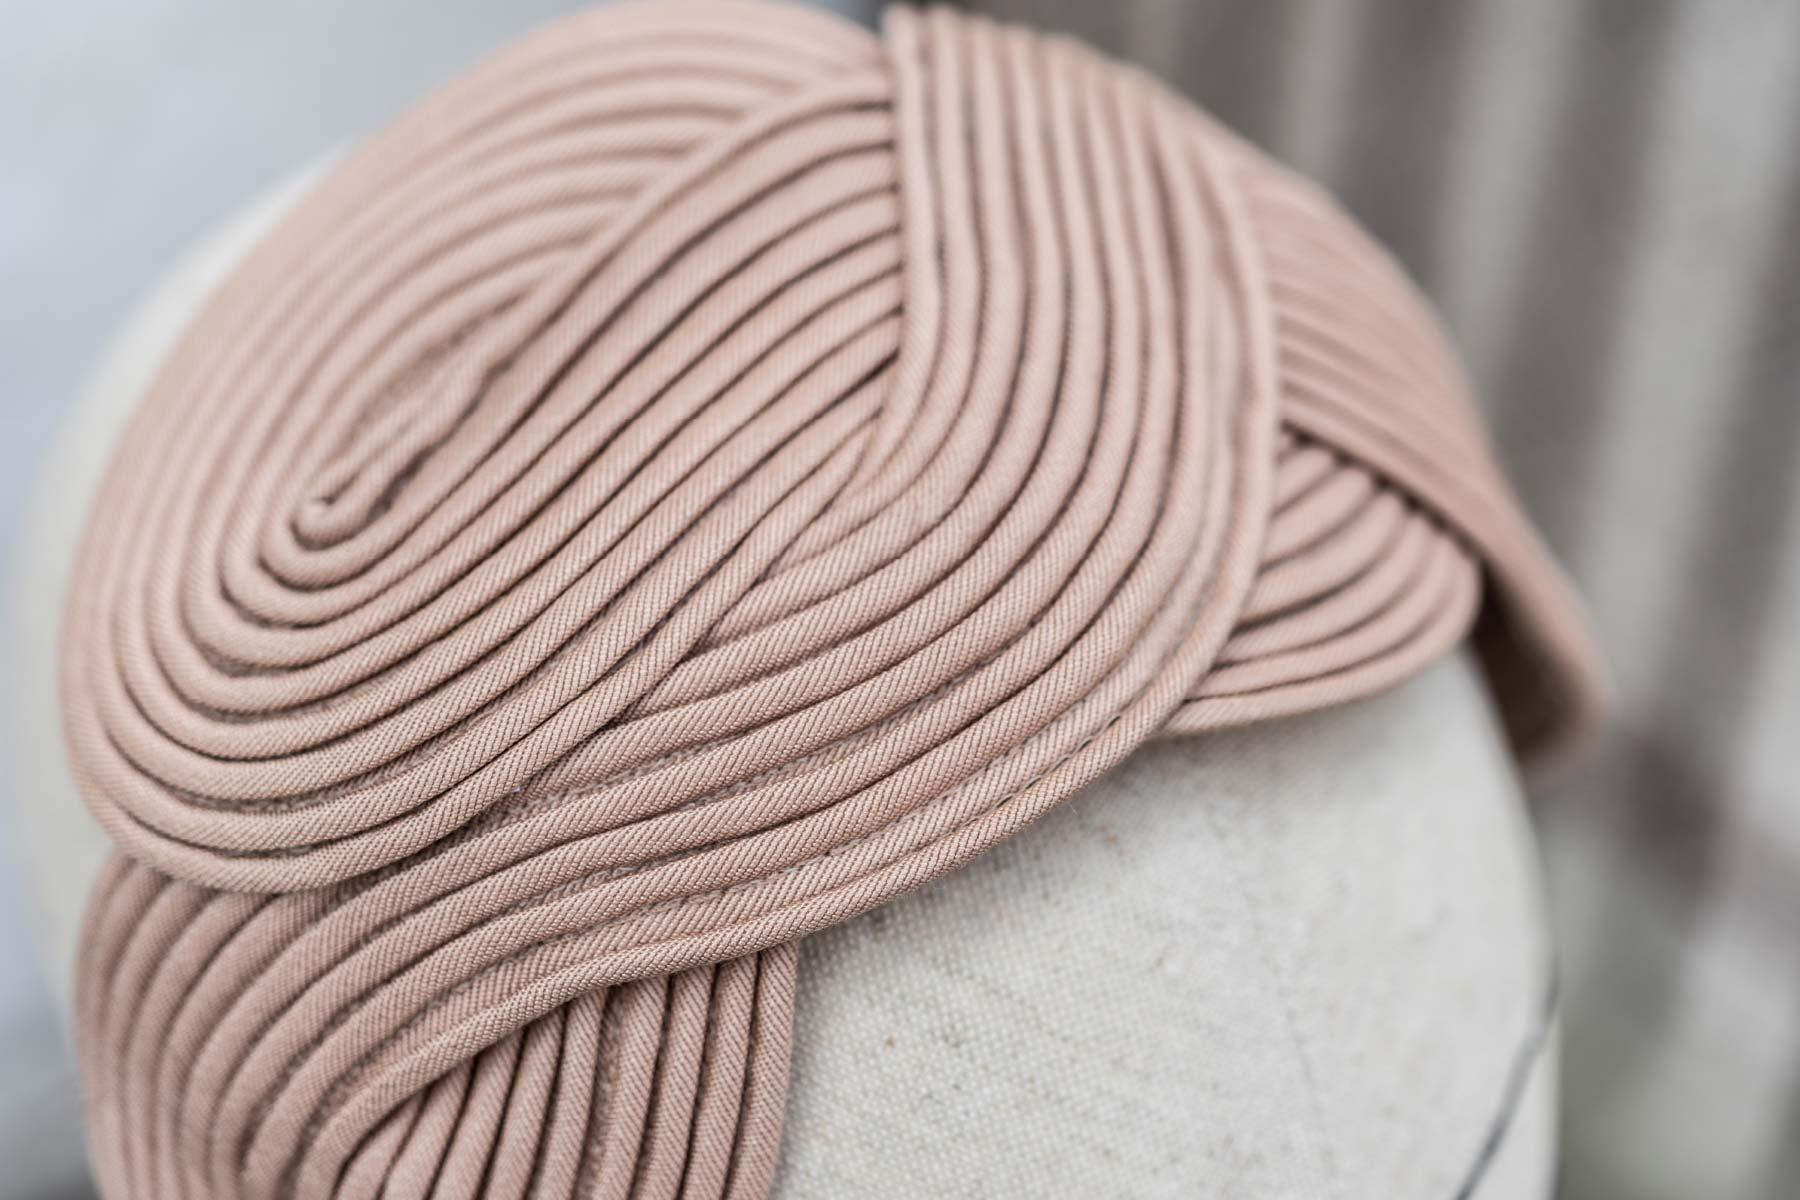 Veronica Innocenzi Acapo Headpiece Waves all over viscose cotton fabric